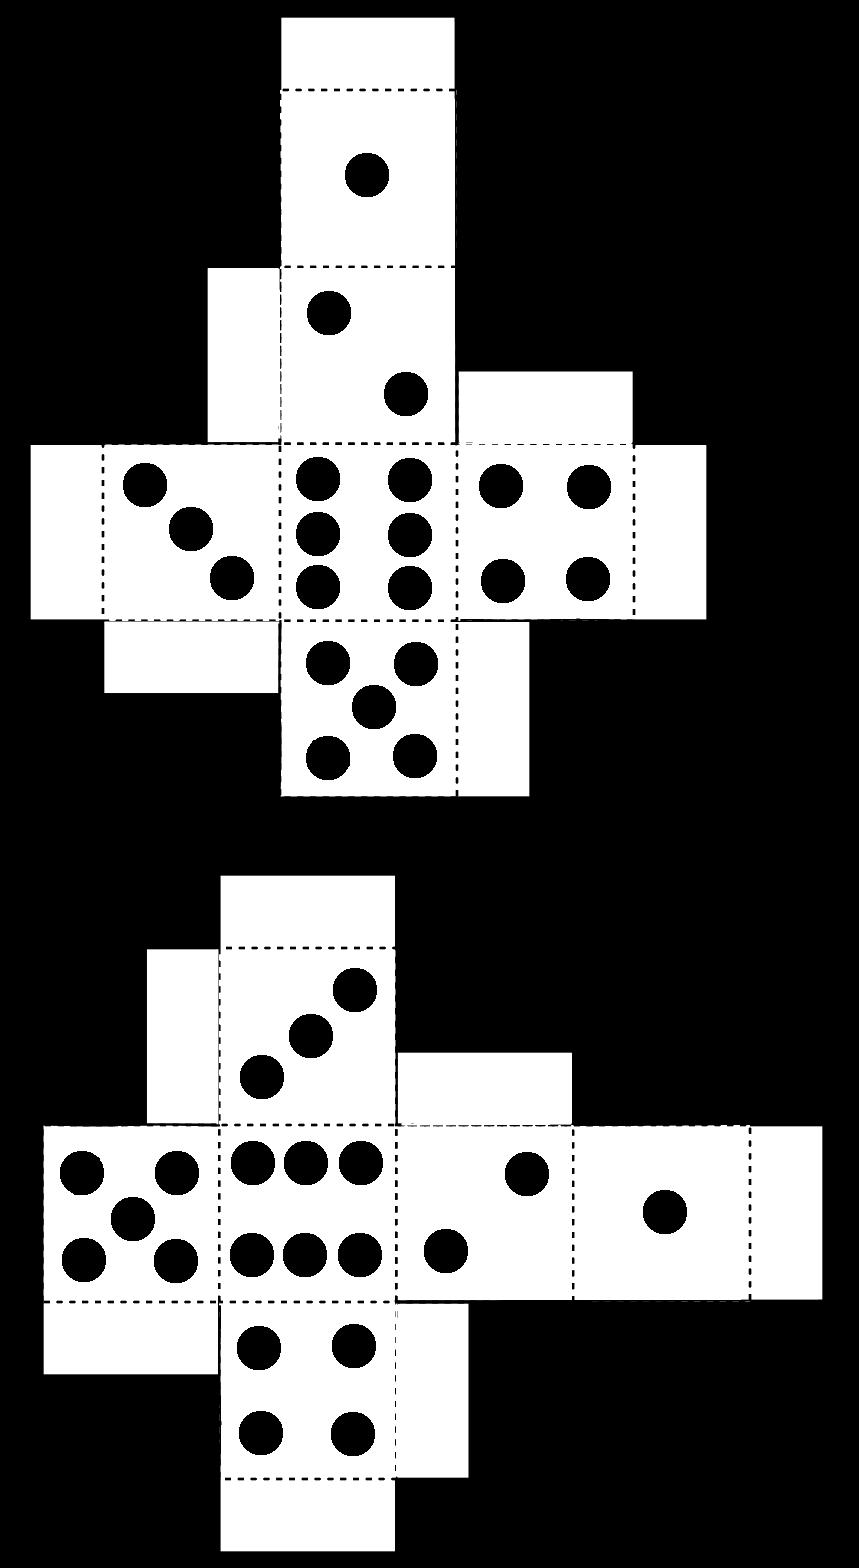 printable dice dice template pdf free download printable printable dice